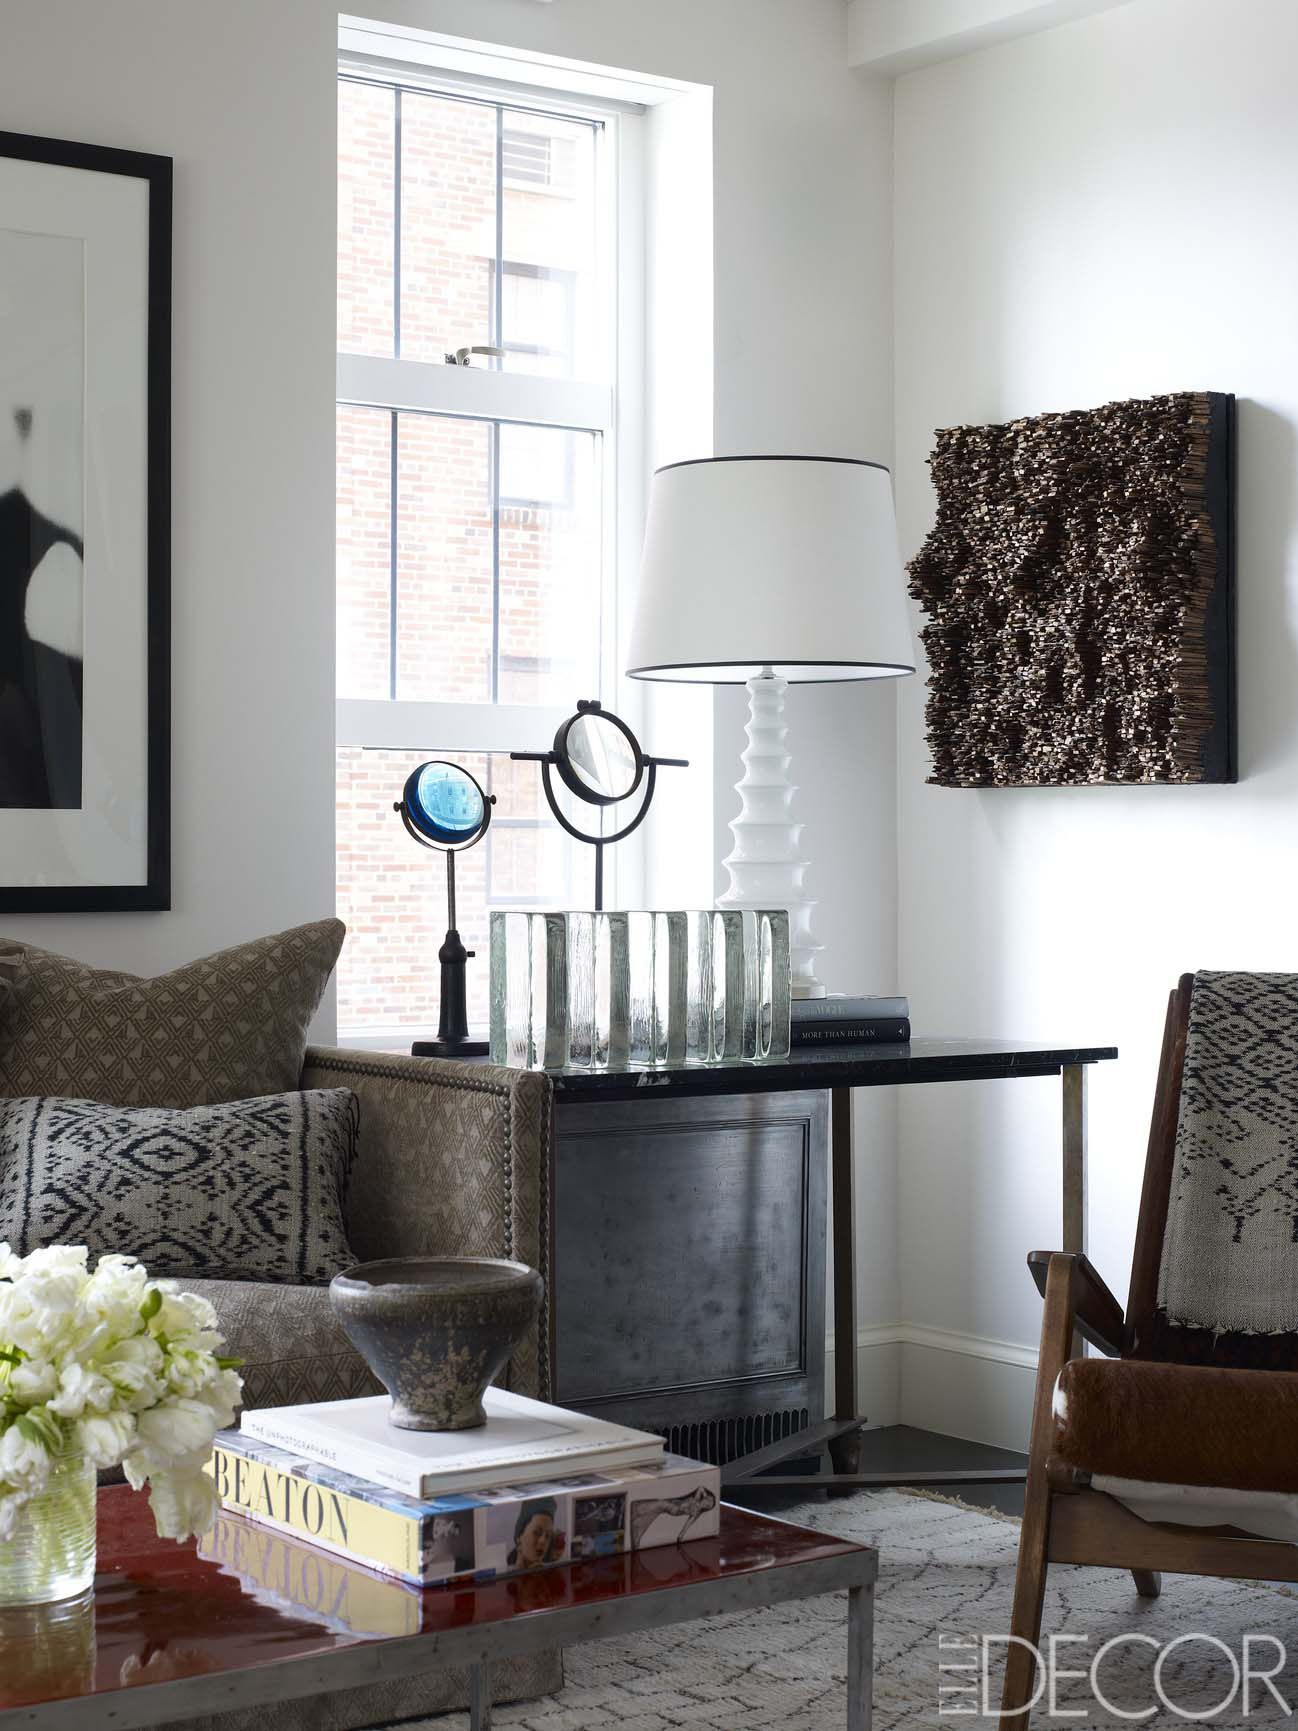 HOUSE TOUR: Inside A Stylishly Neutral New York City Apartment ...